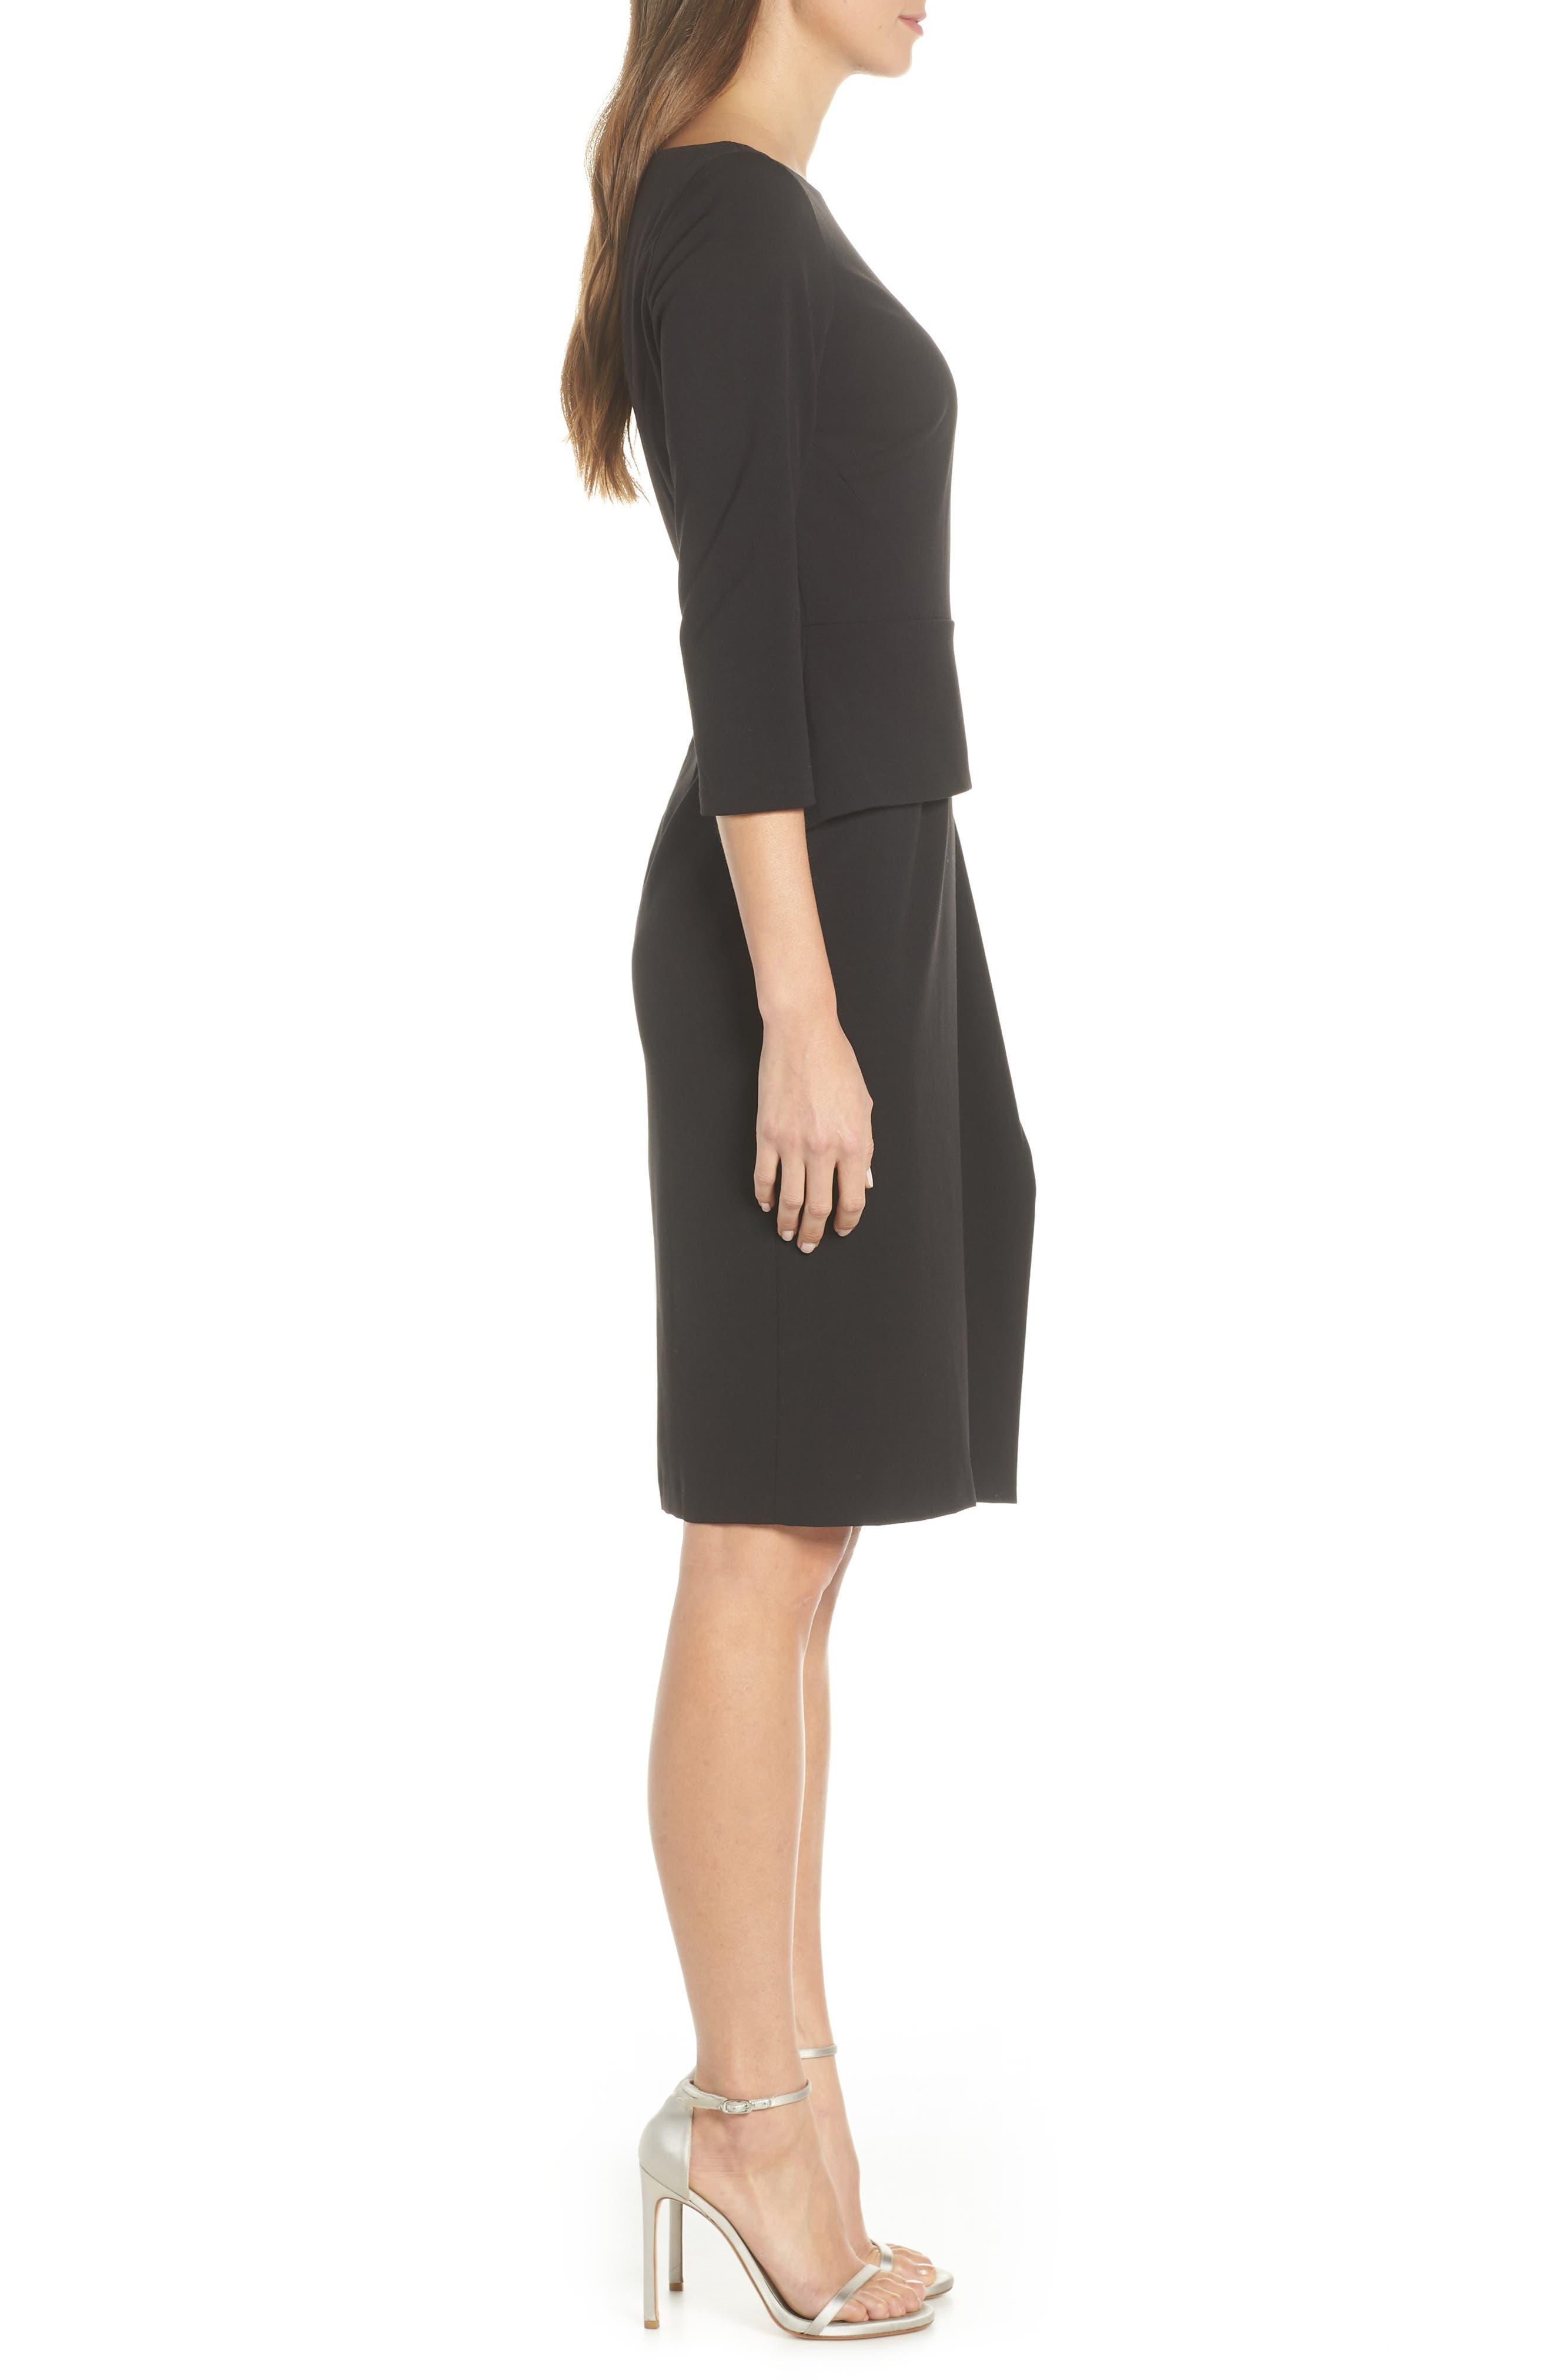 VINCE CAMUTO,                             Angled Ruffle Sheath Dress,                             Alternate thumbnail 4, color,                             BLACK